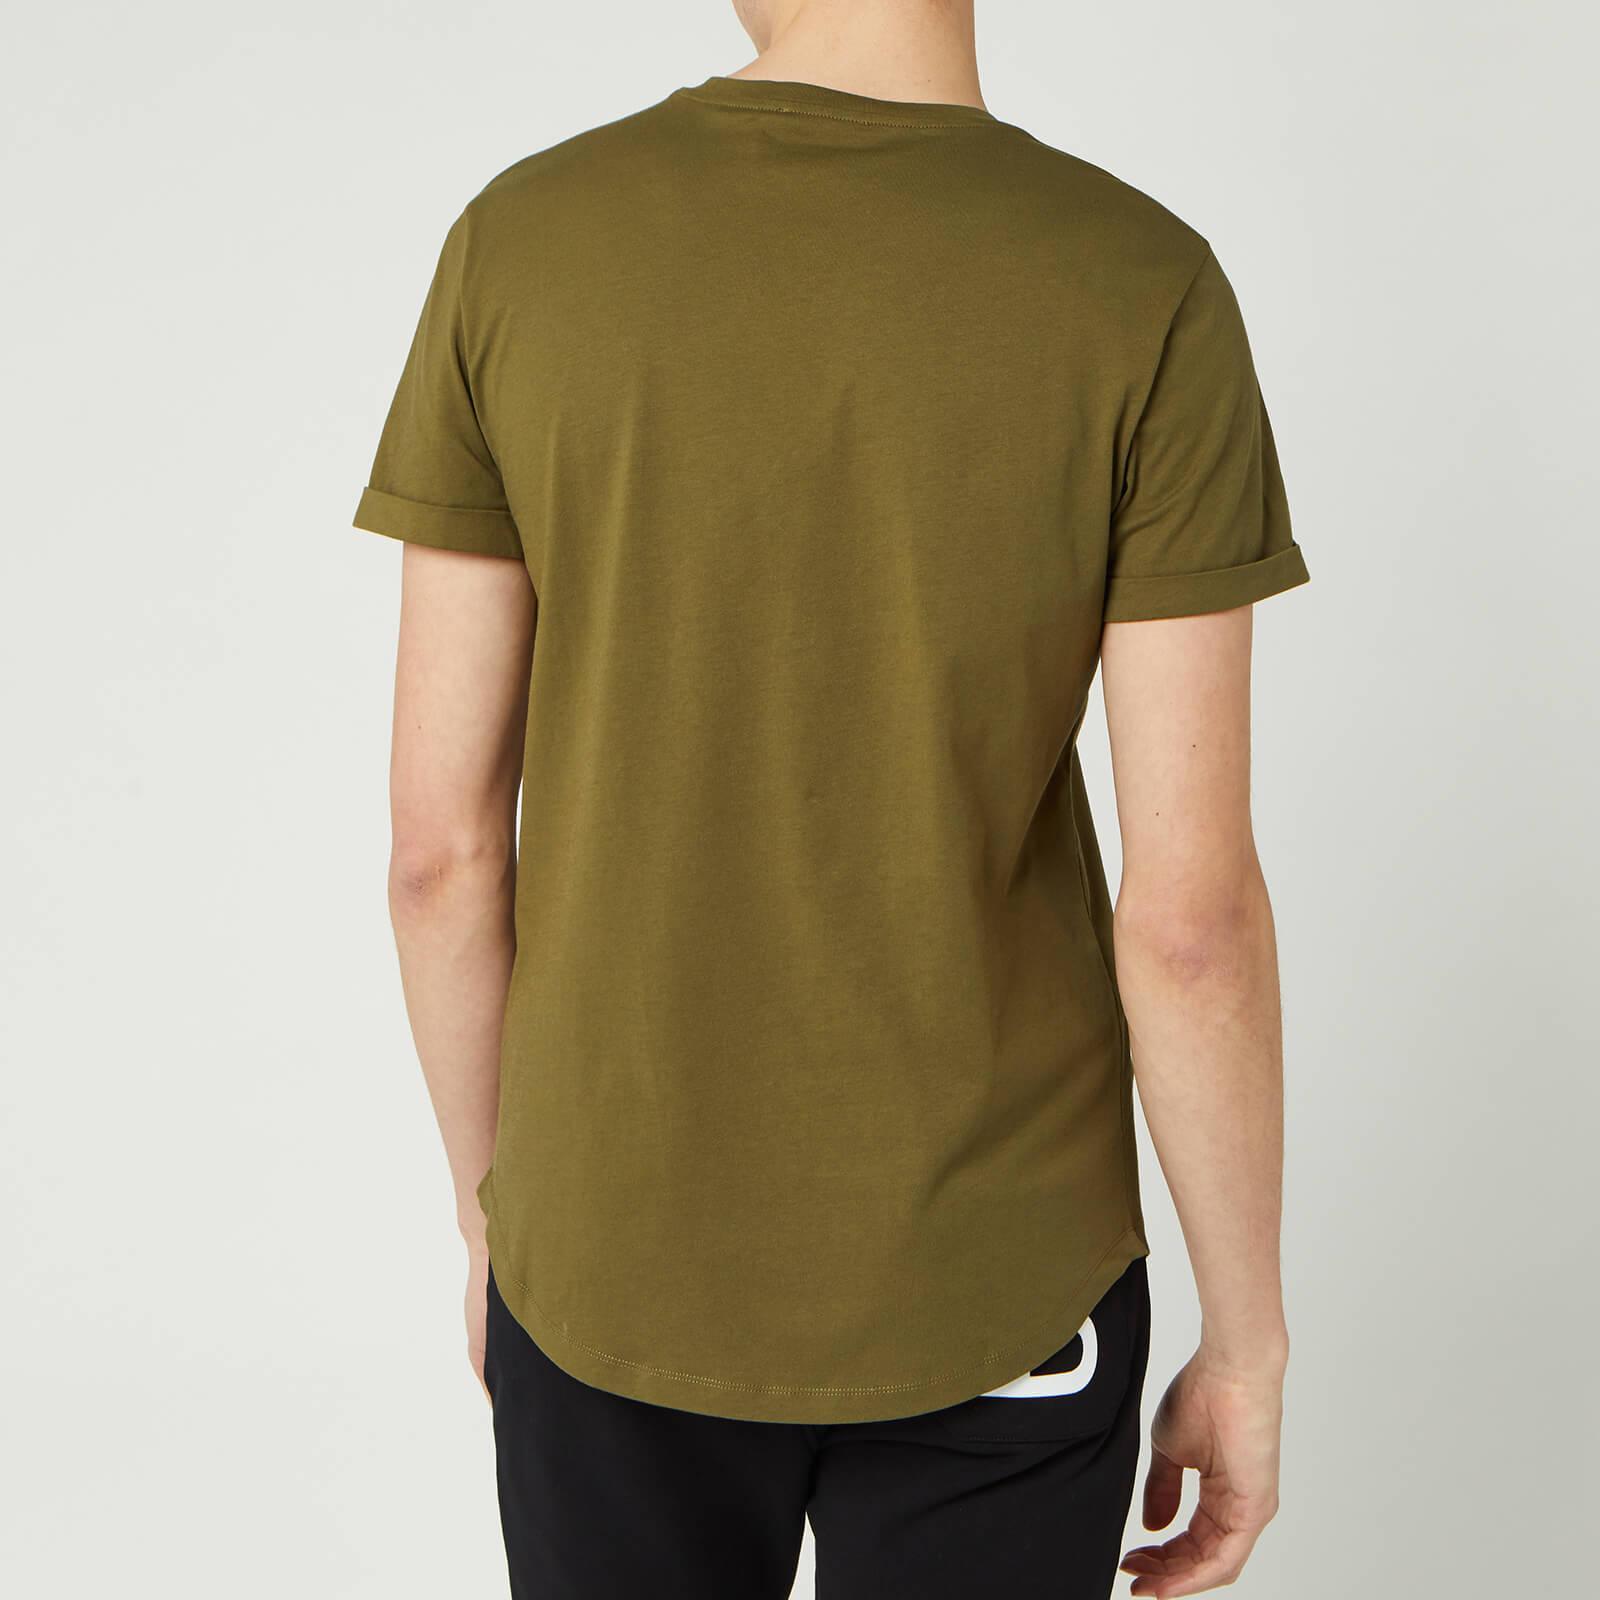 coin shirt